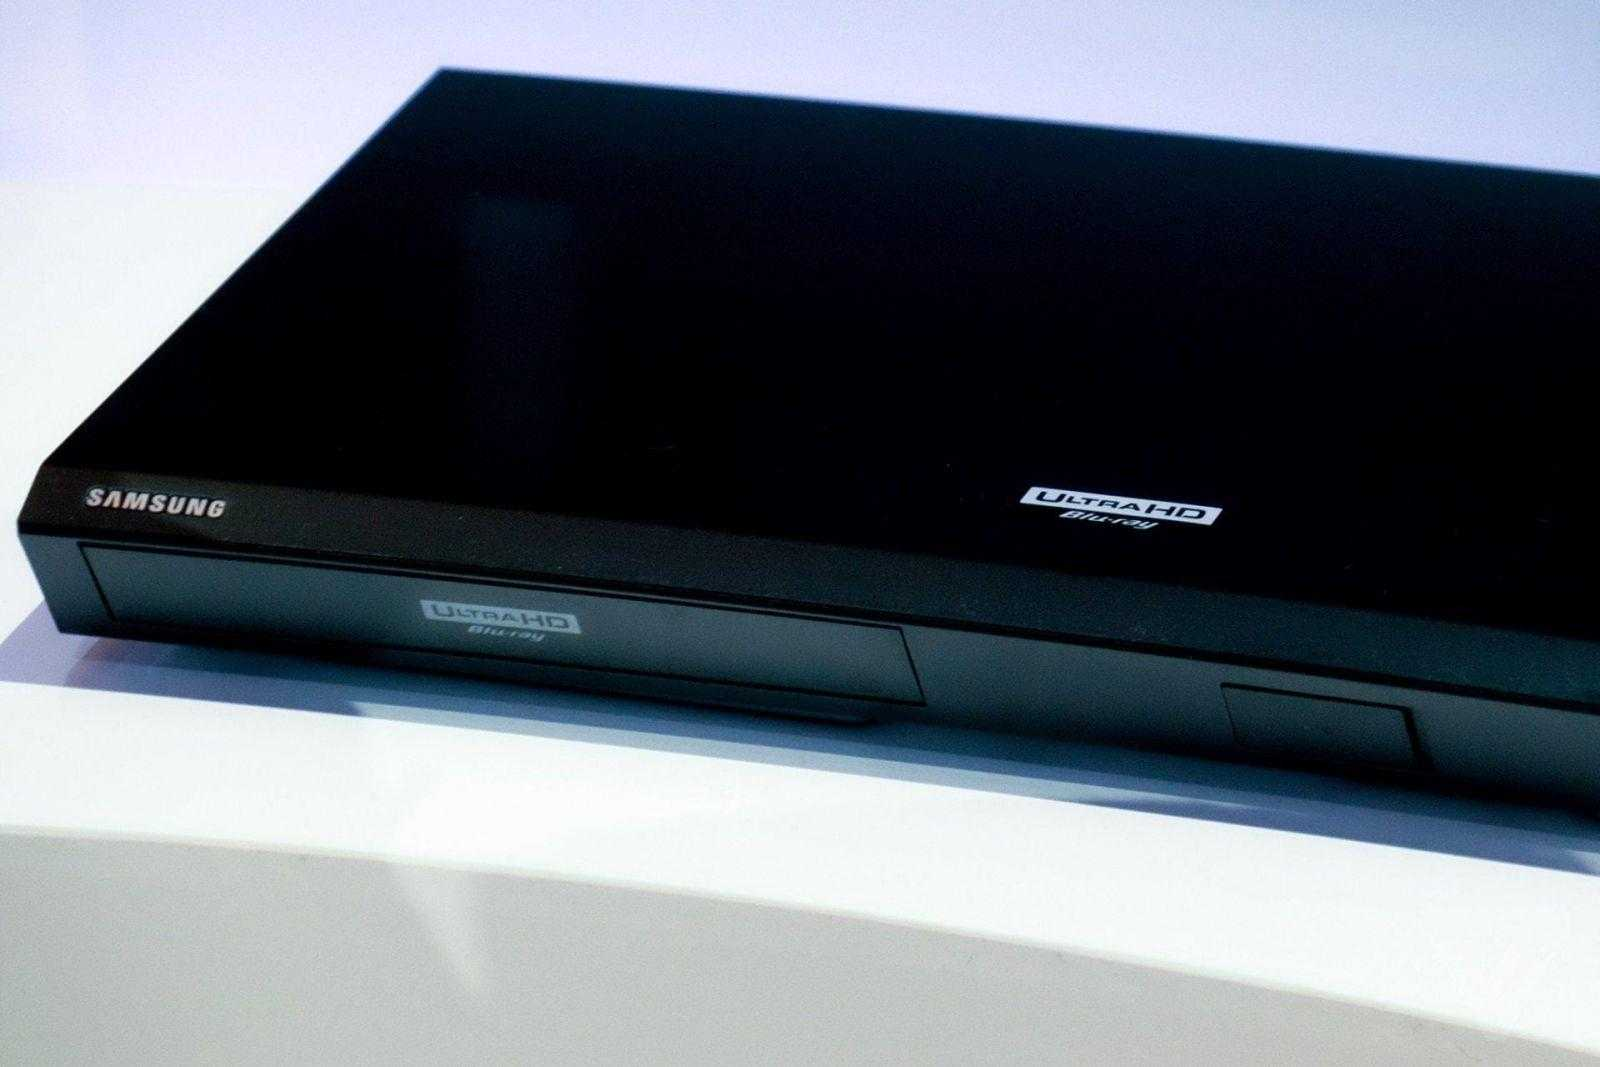 Samsung прекратил выпуск Blu-ray плееров (samsungwm8 2040.0.0 1)